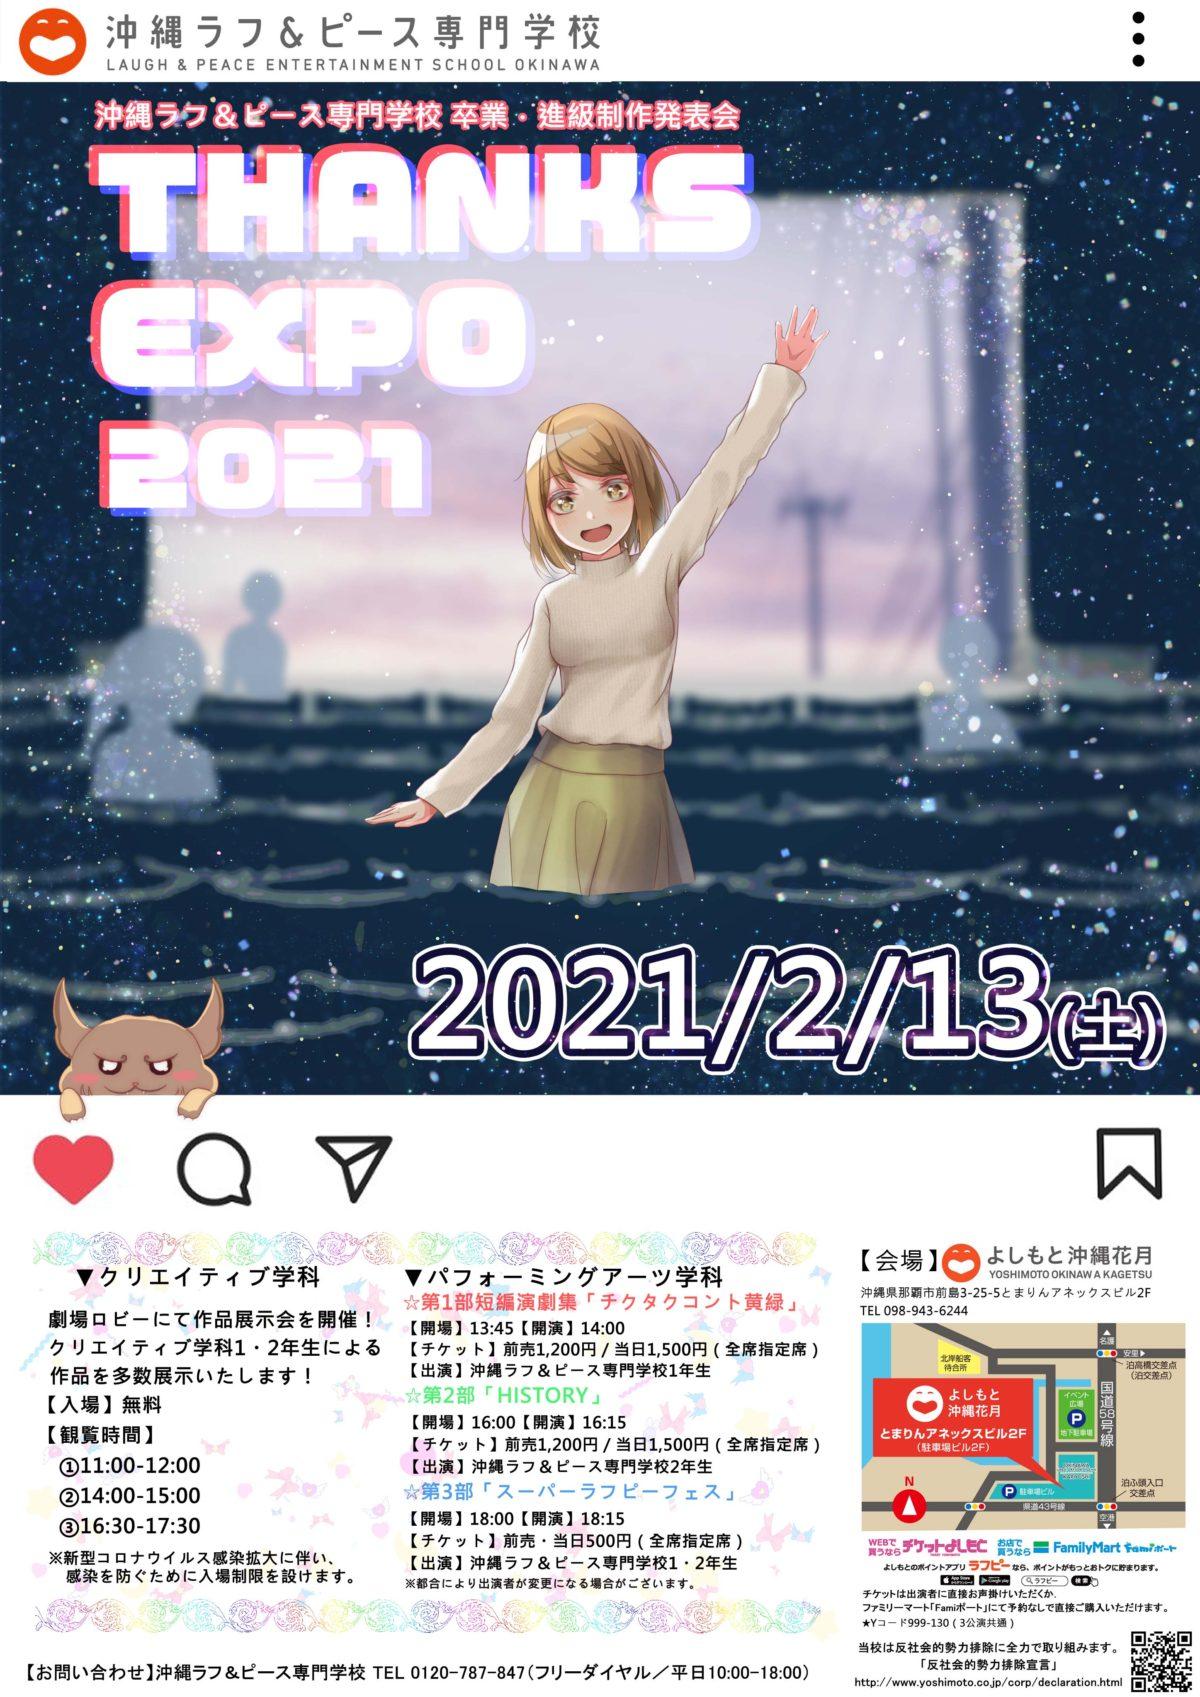 沖縄ラフ&ピース専門学校 卒業・進級制作発表会「Thanks EXPO 2021」開催! 2月13日(土)